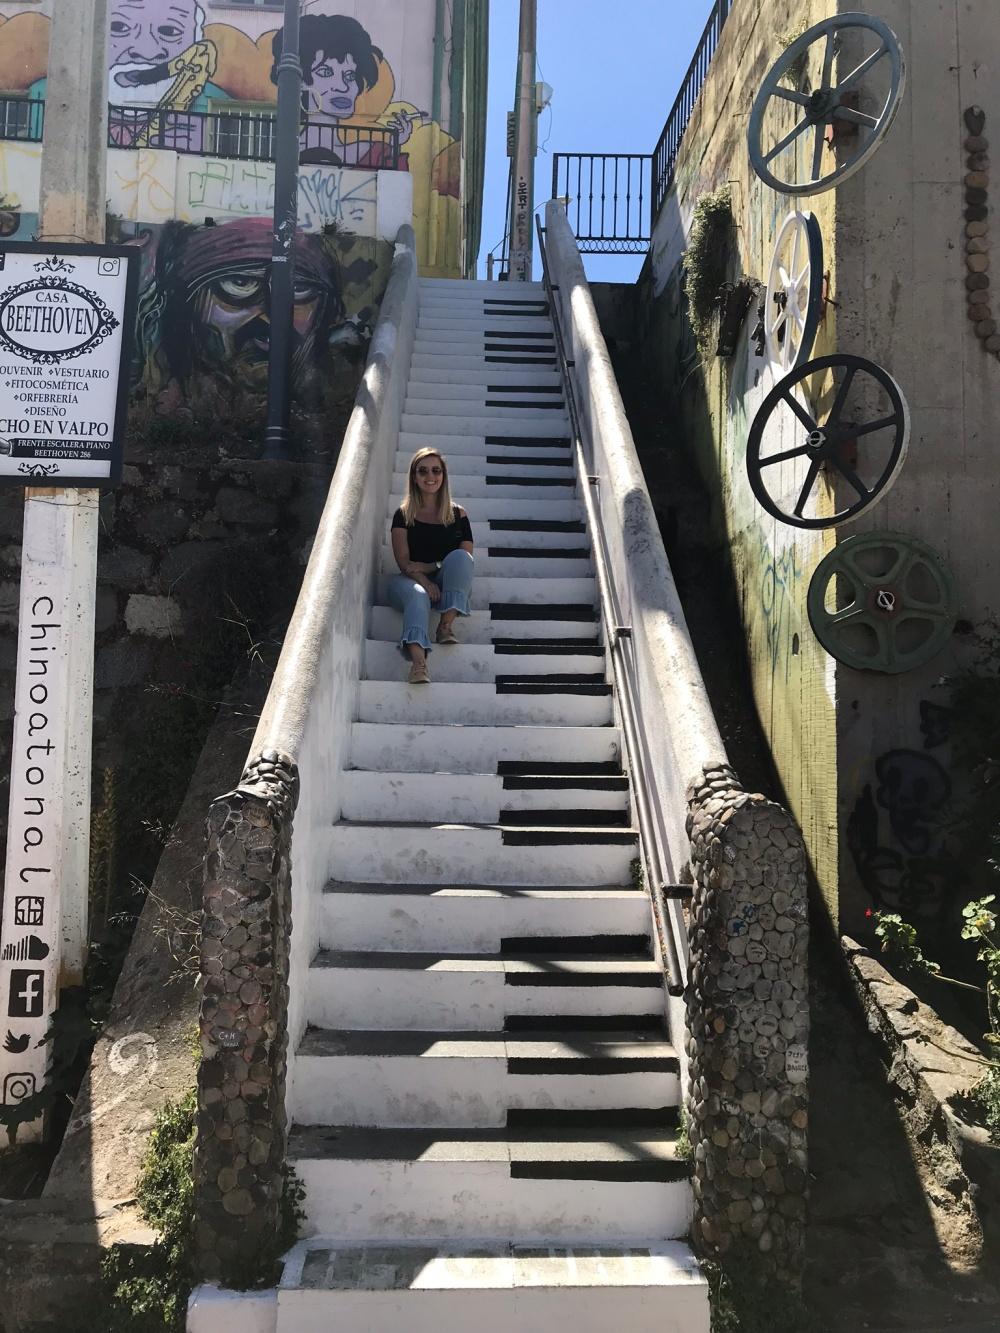 Escada de teclado no Chile, Valparaíso